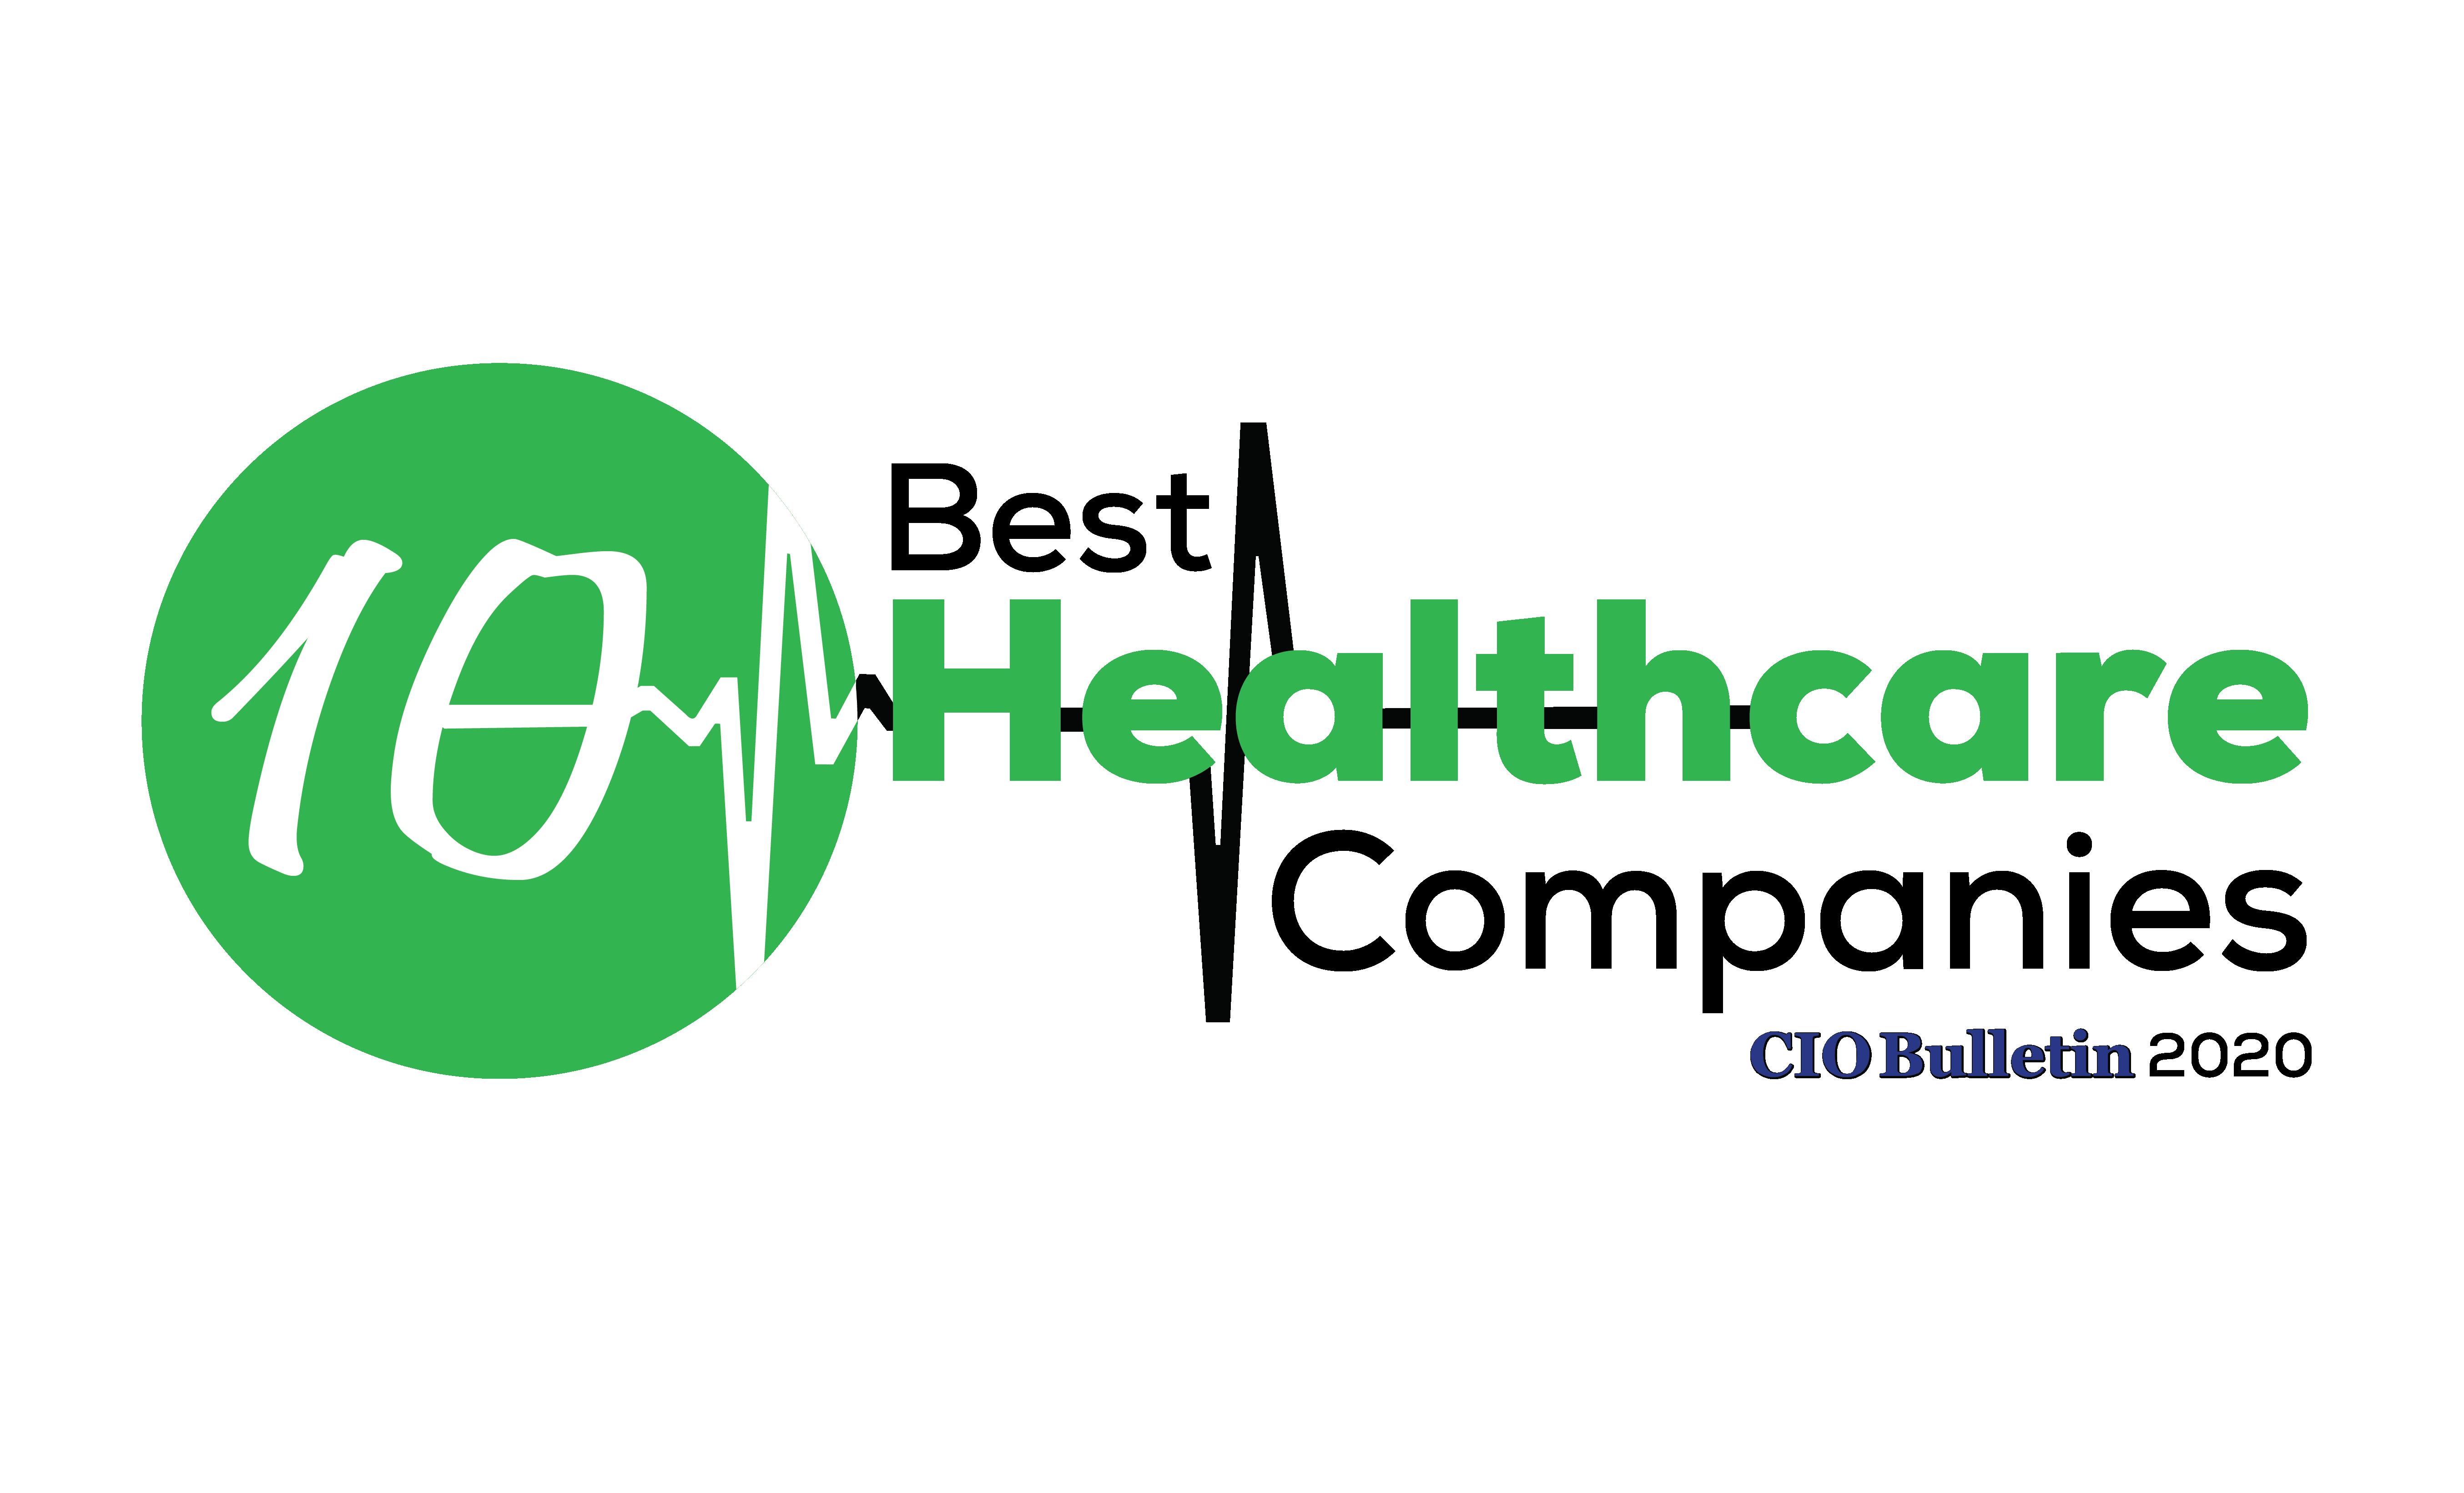 Ciobulletin Latest Magazine 2020 In 2020 Healthcare Companies Health Care Best